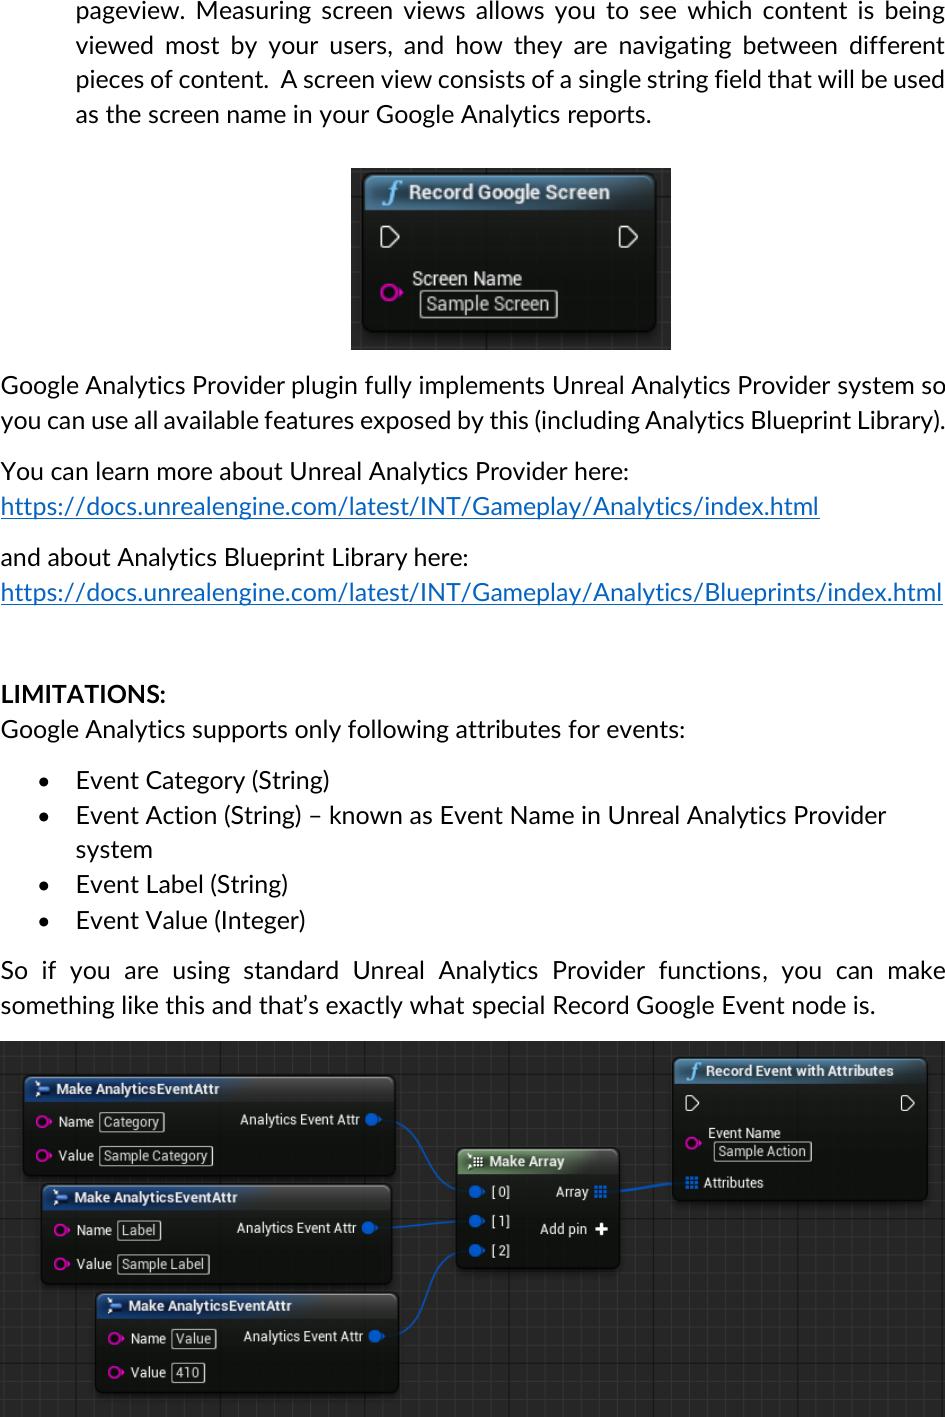 Google Analytics User Guide